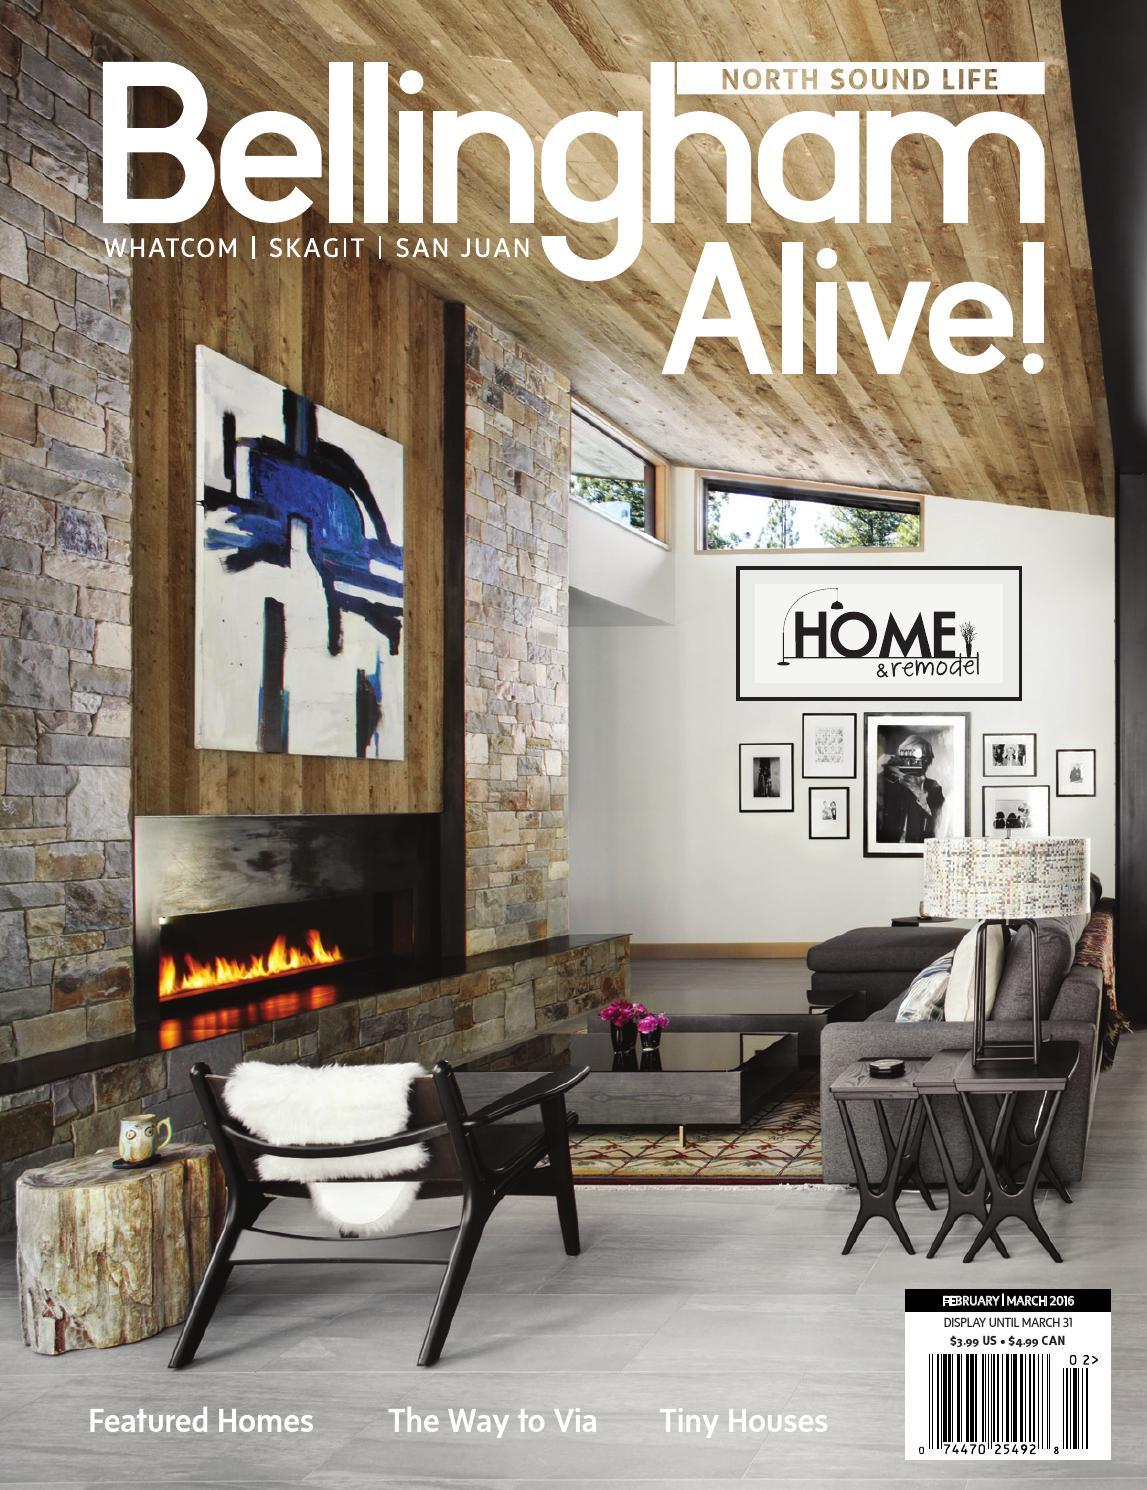 Bellingham alive feb mar 2016 by k l media issuu